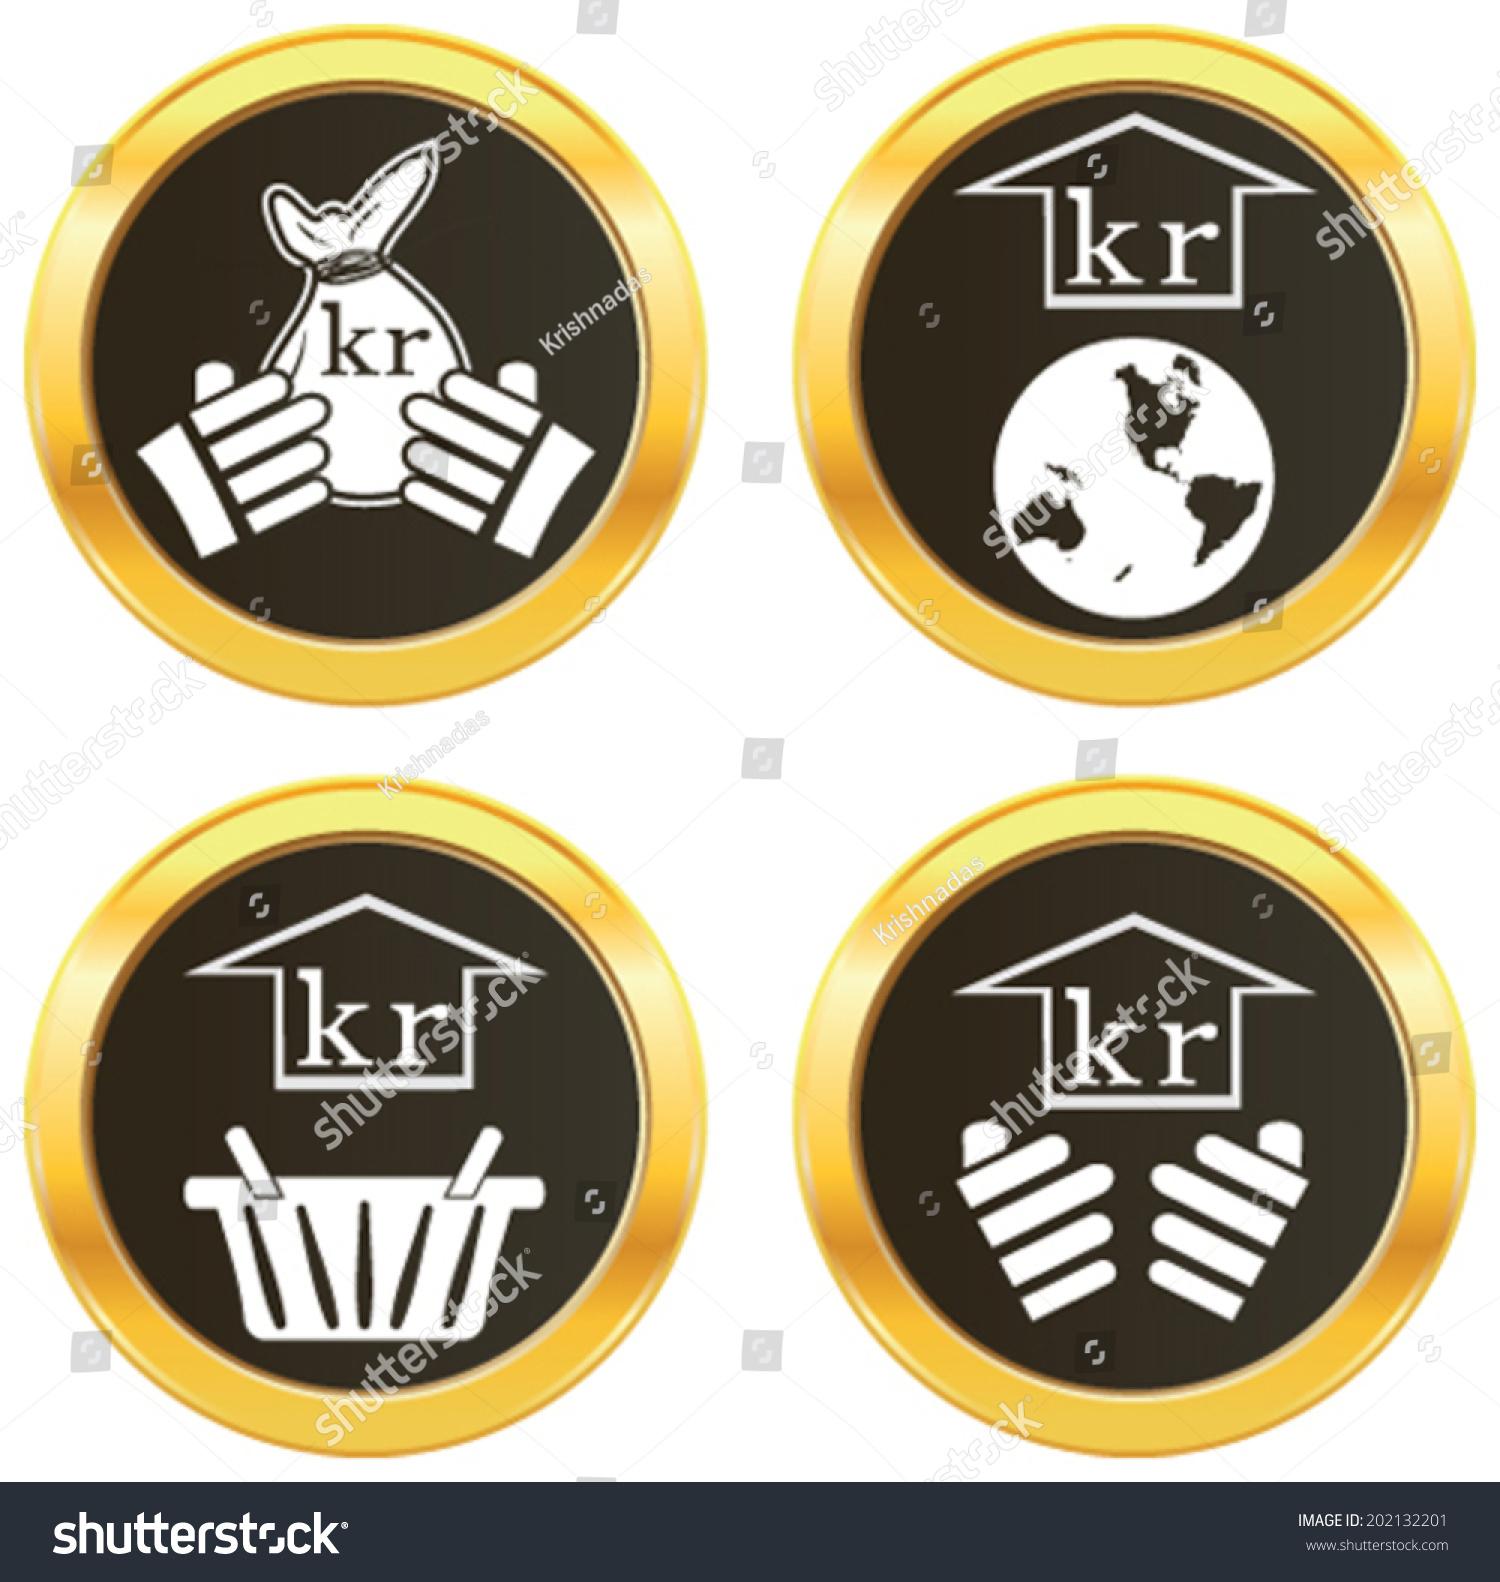 Krona Currency Symbol Representing Money Many Stock Vector Royalty